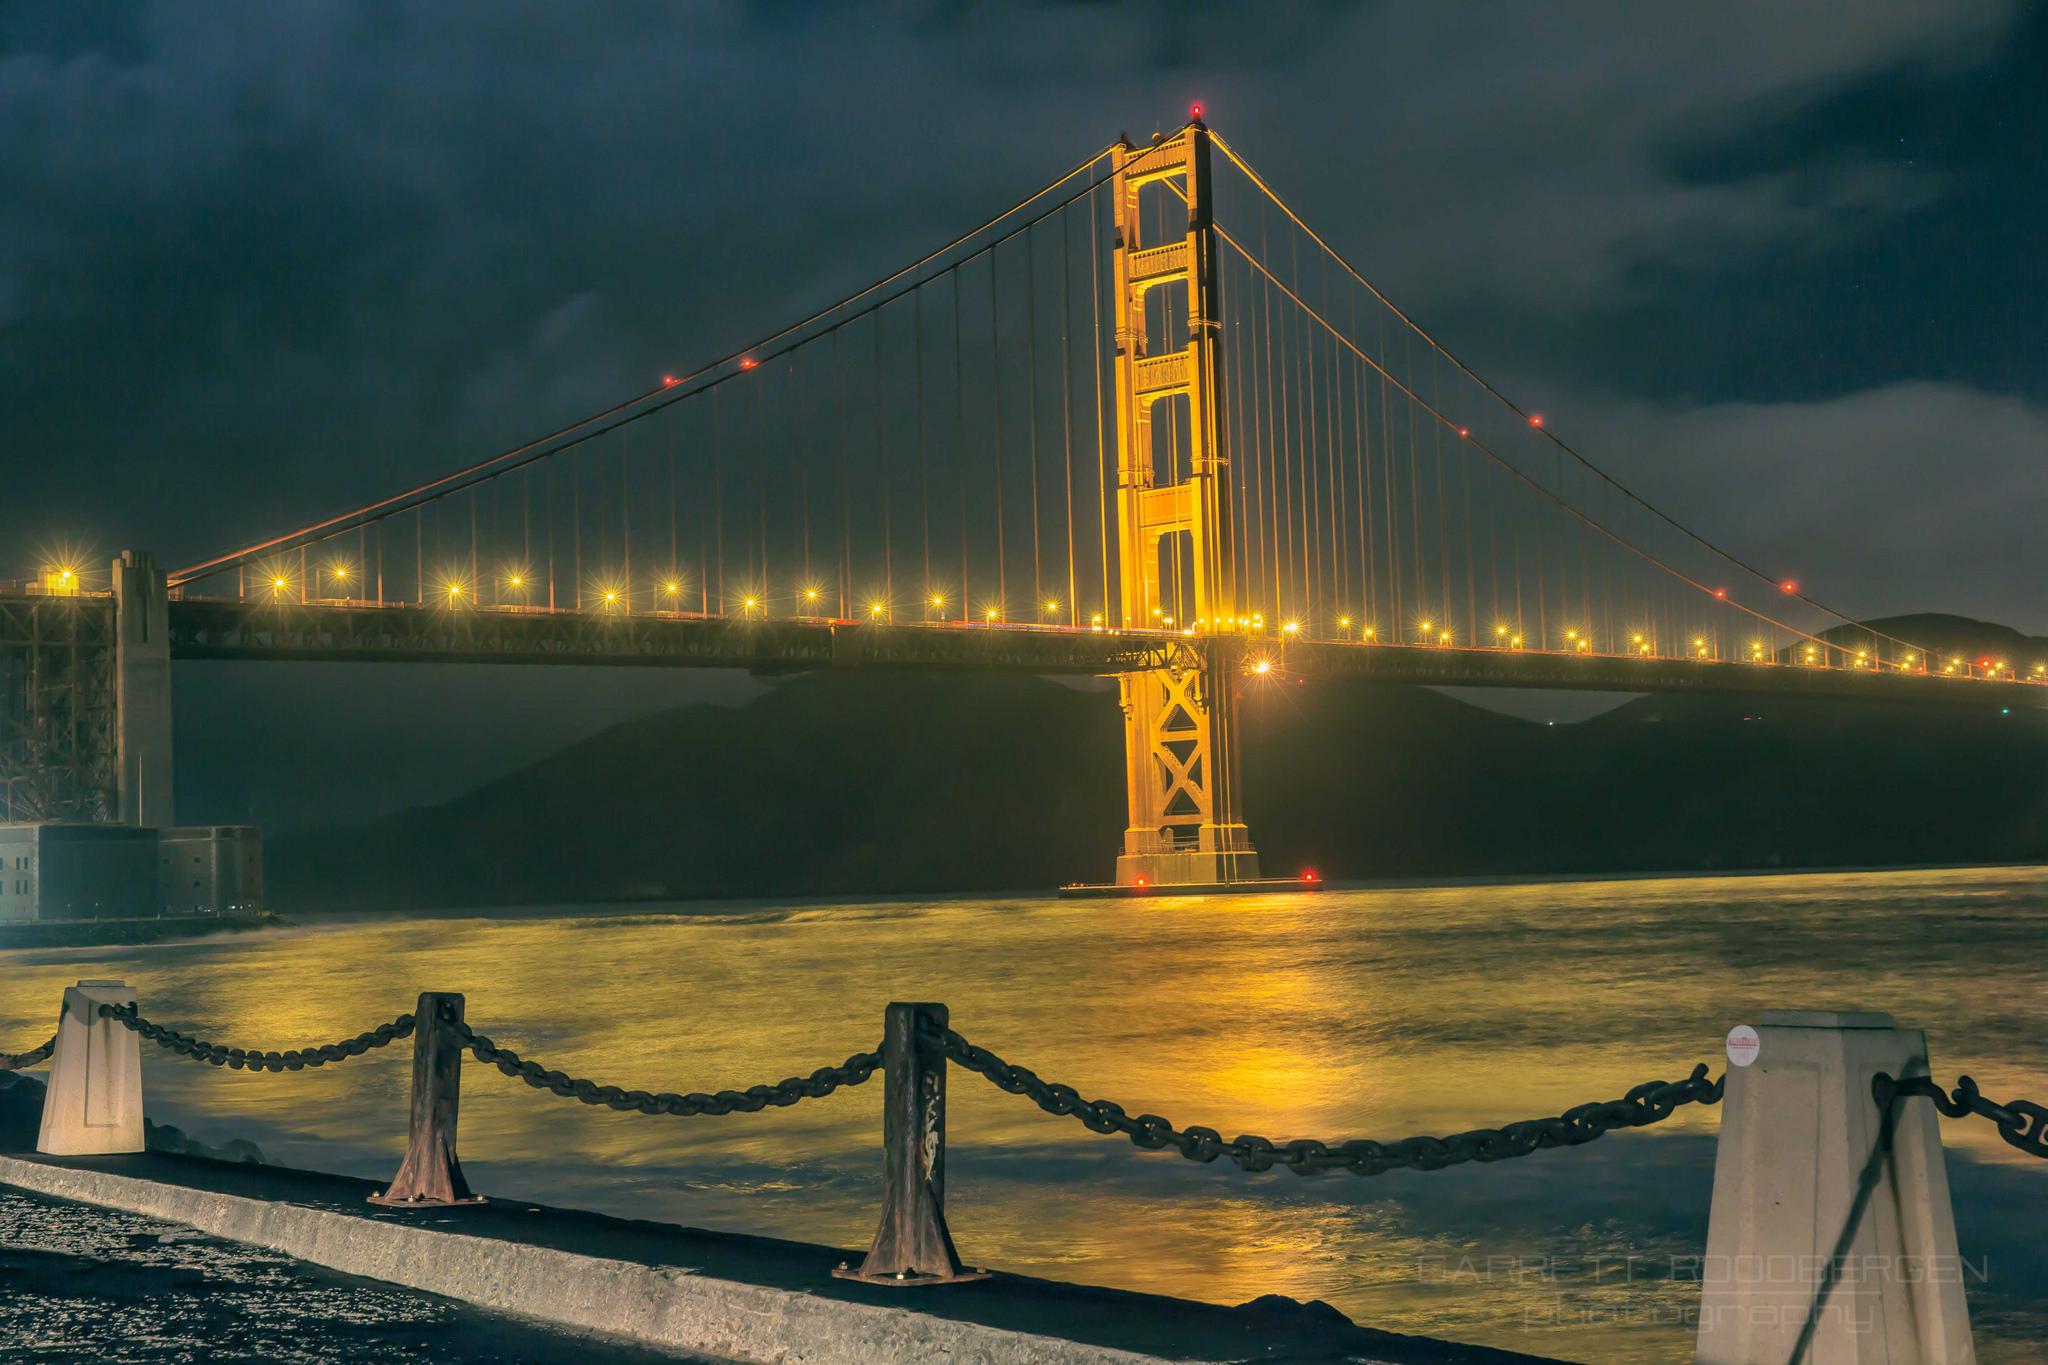 Bay of Gold under the Golden Gate #sanfrancisco #goldengatebridge #bay #gold #photographyislife #photography #california #life #live #adventure #monument #tour #vacation #capture #canon #5dmarkiii #adobe #photoshop #google #nikfilter